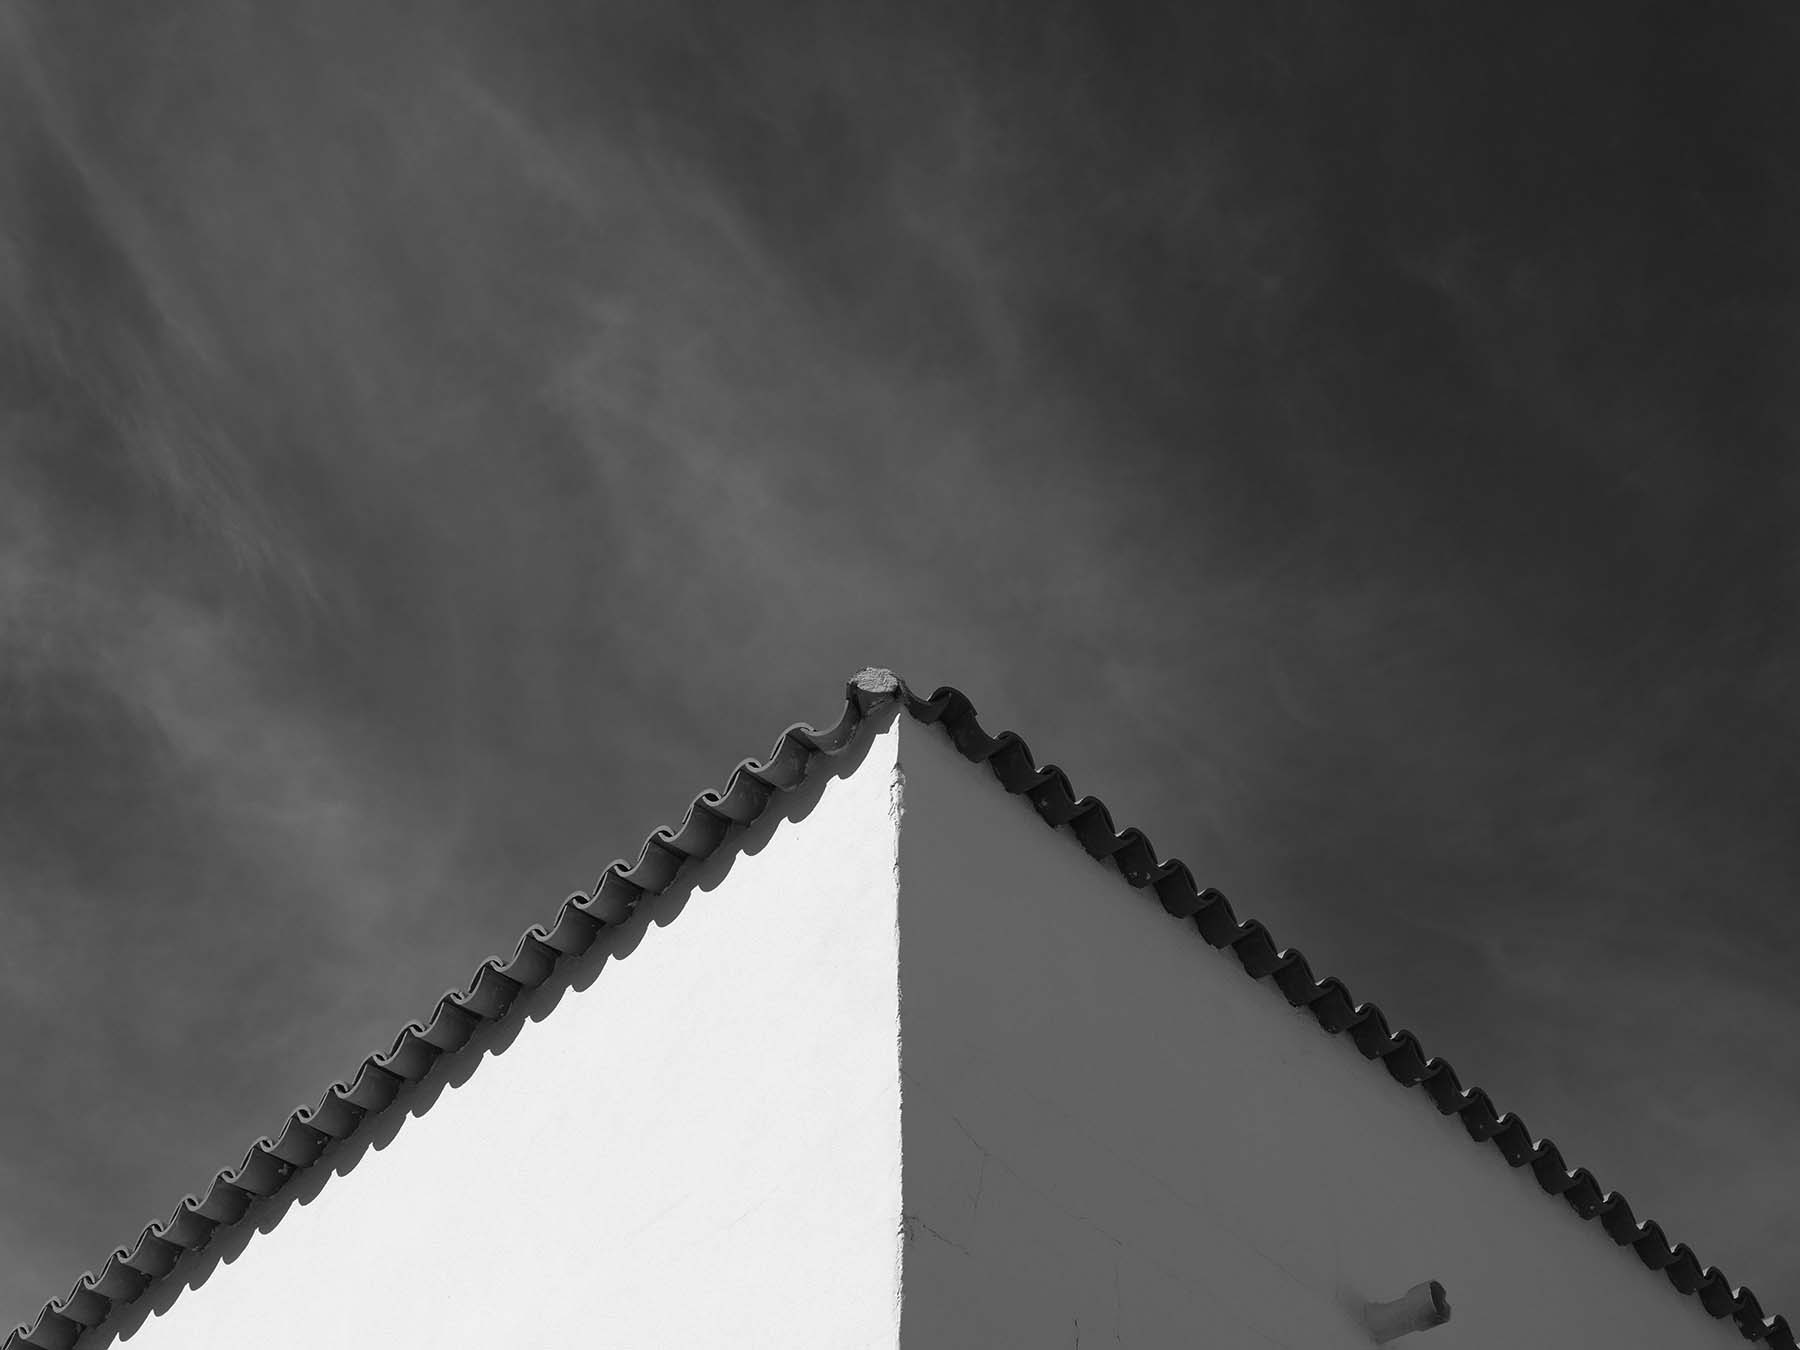 Canary Island 1, Spain